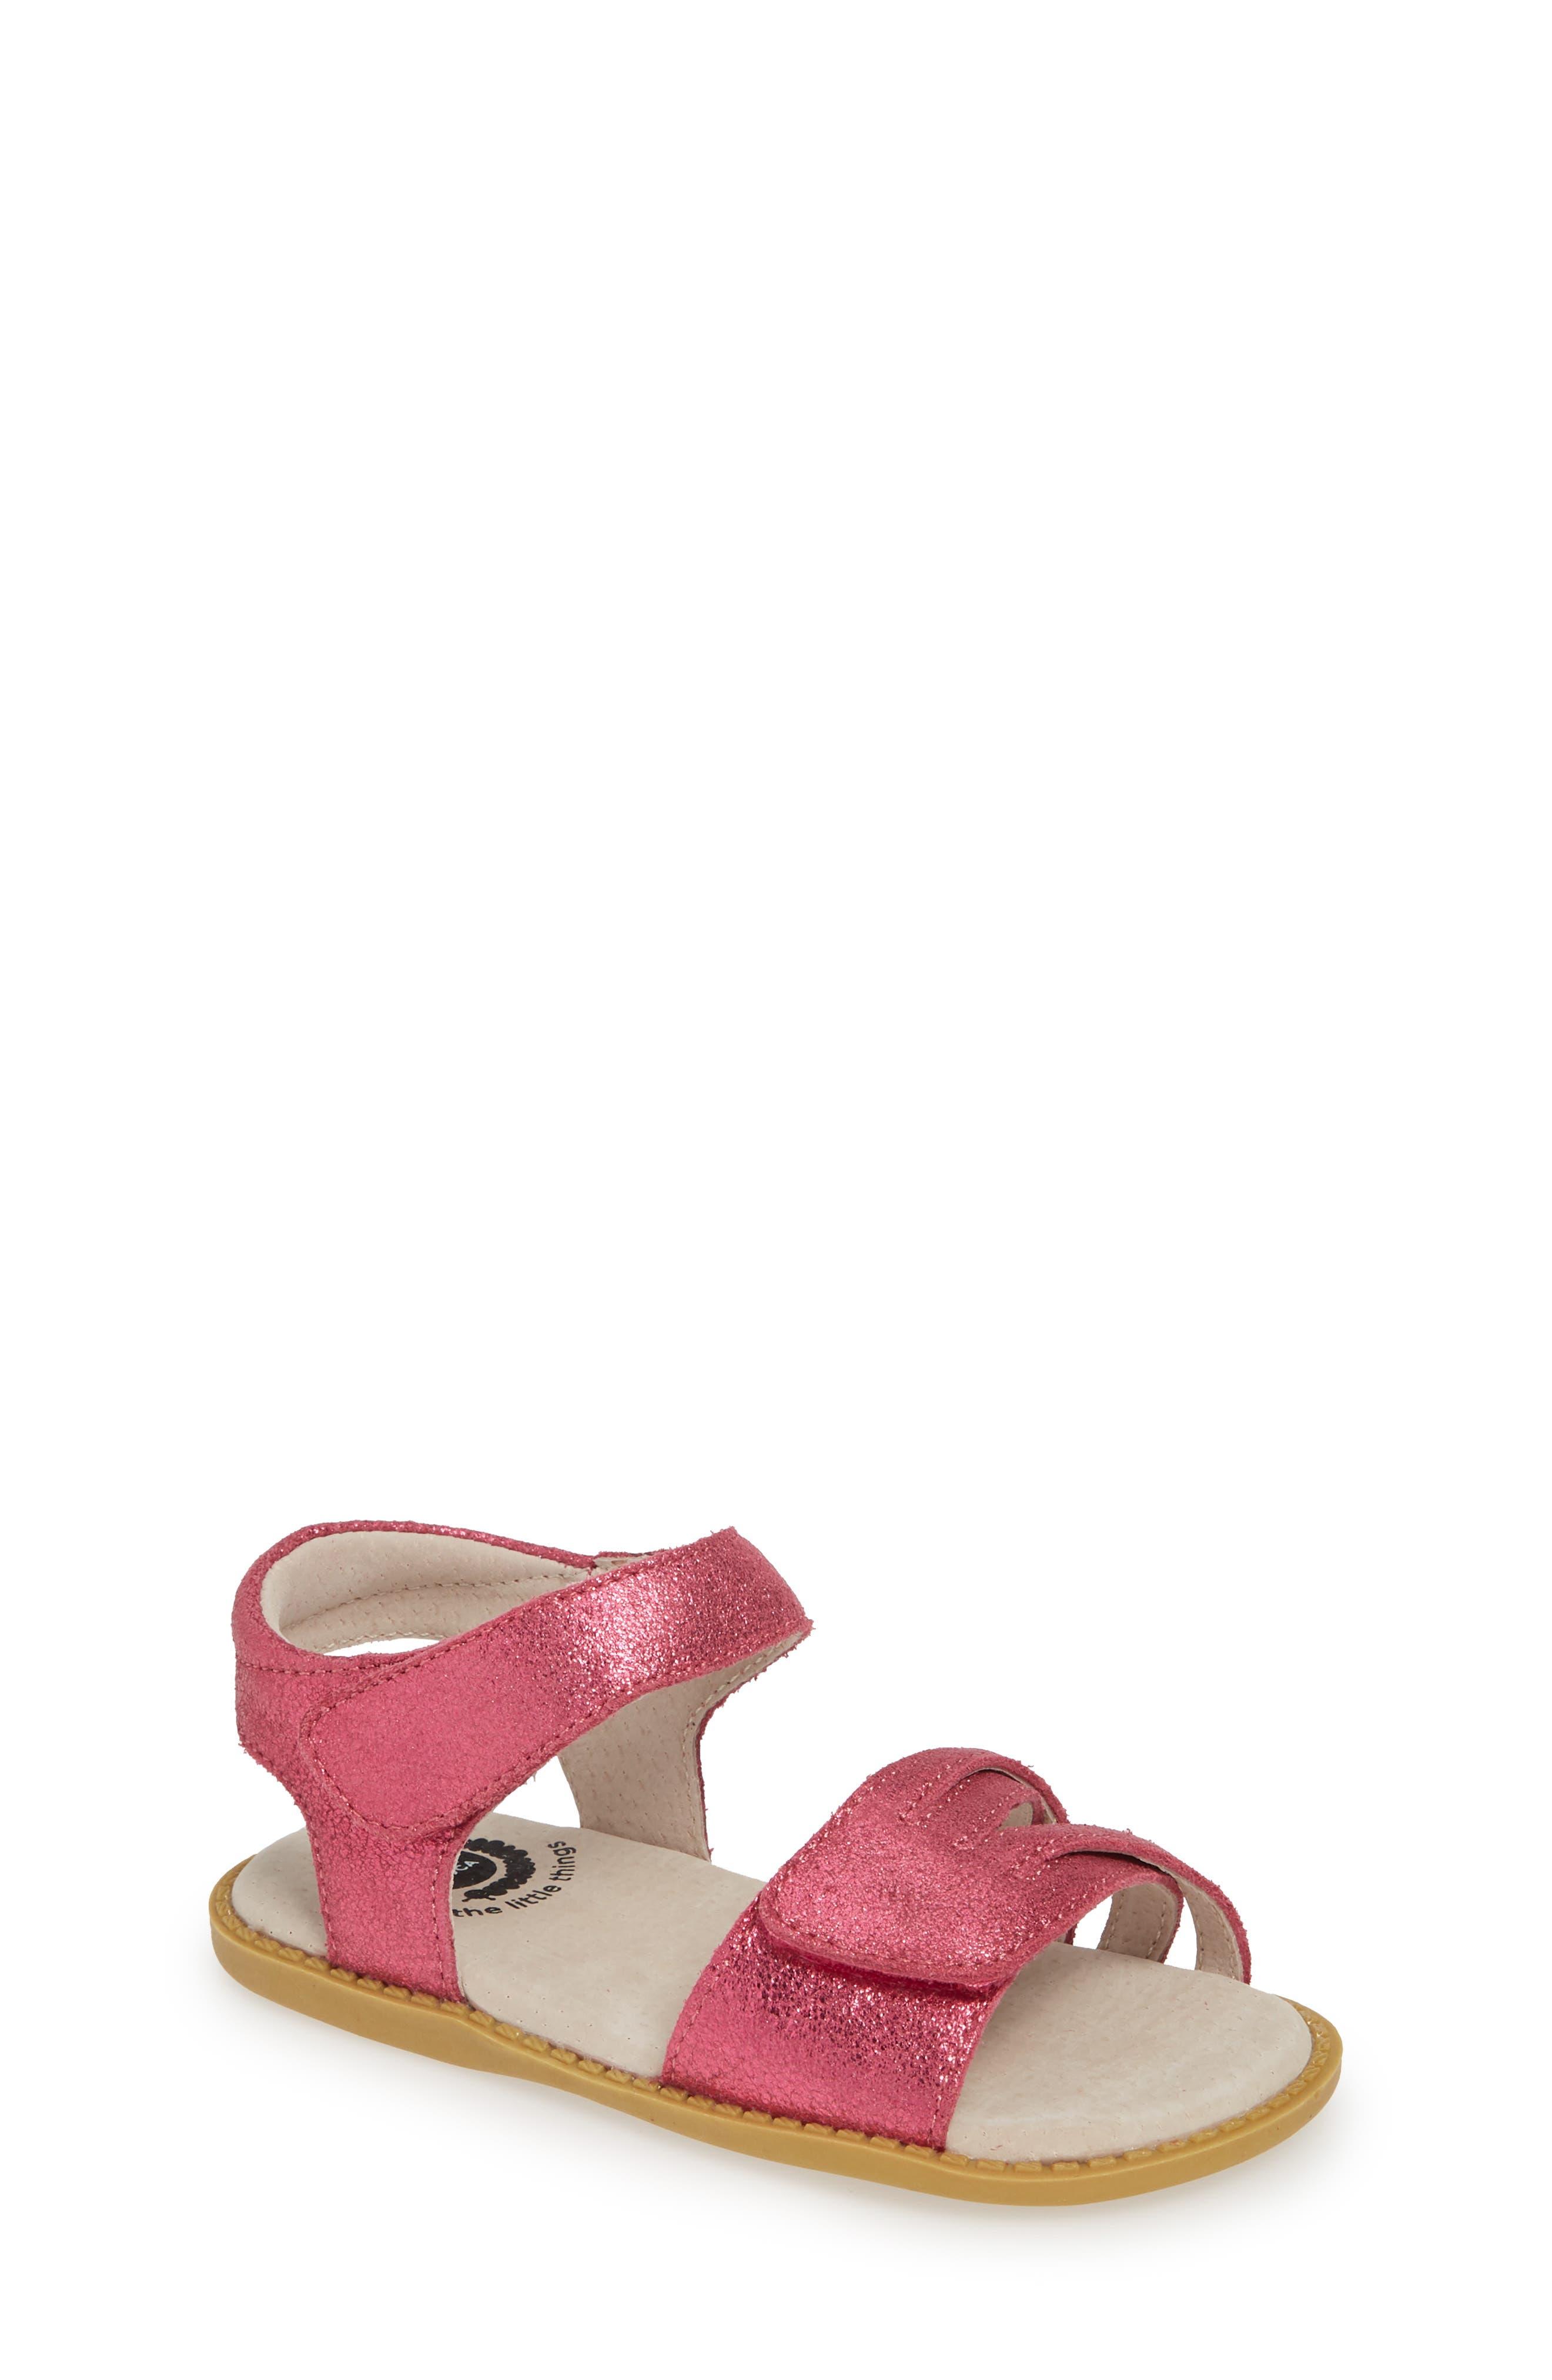 1e9fe87addc Livie   Luca Kids  Shoes